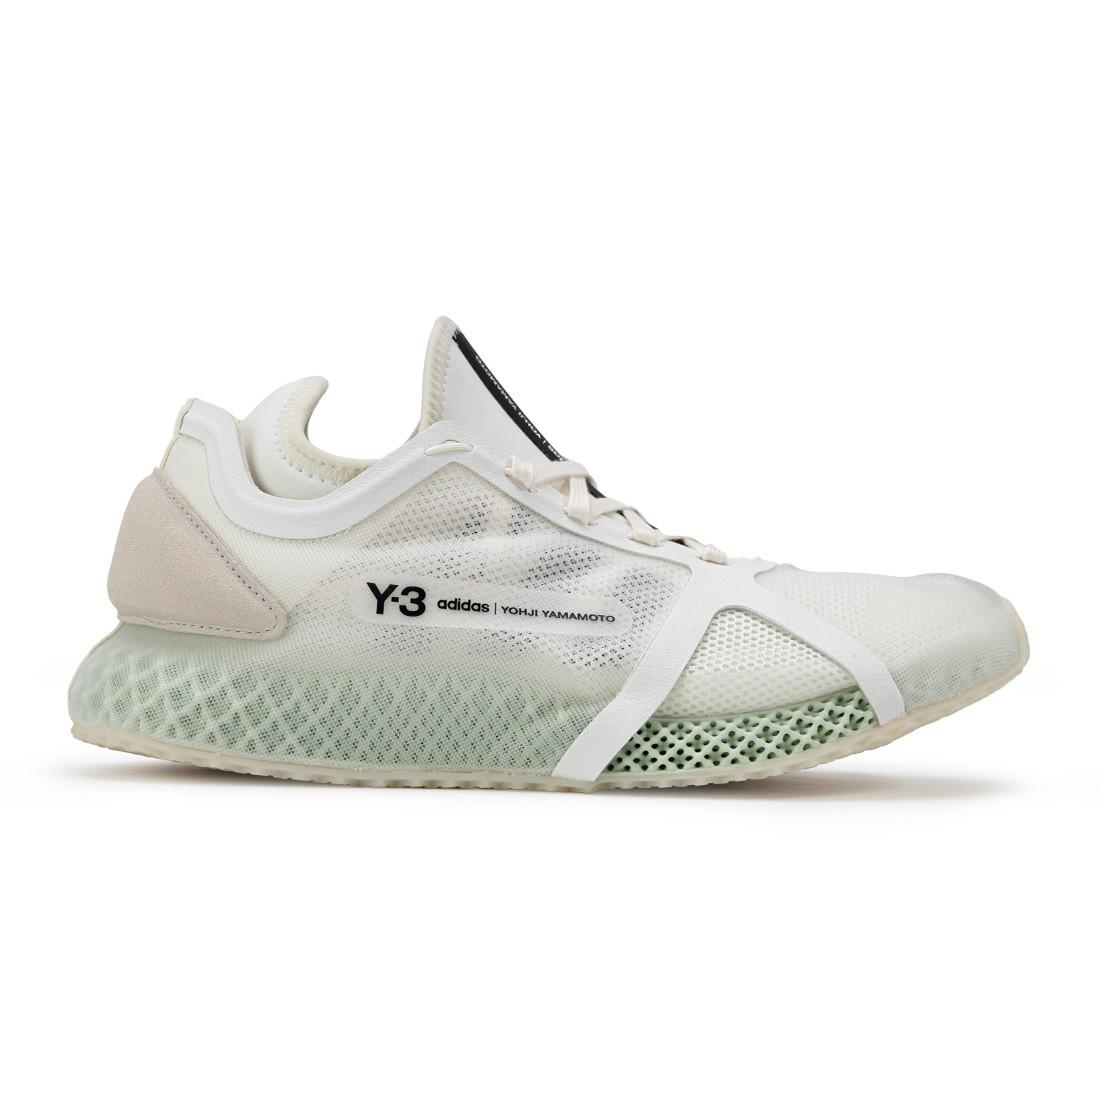 Adidas Y-3 Men Runner 4D IOW (white / off white / black)